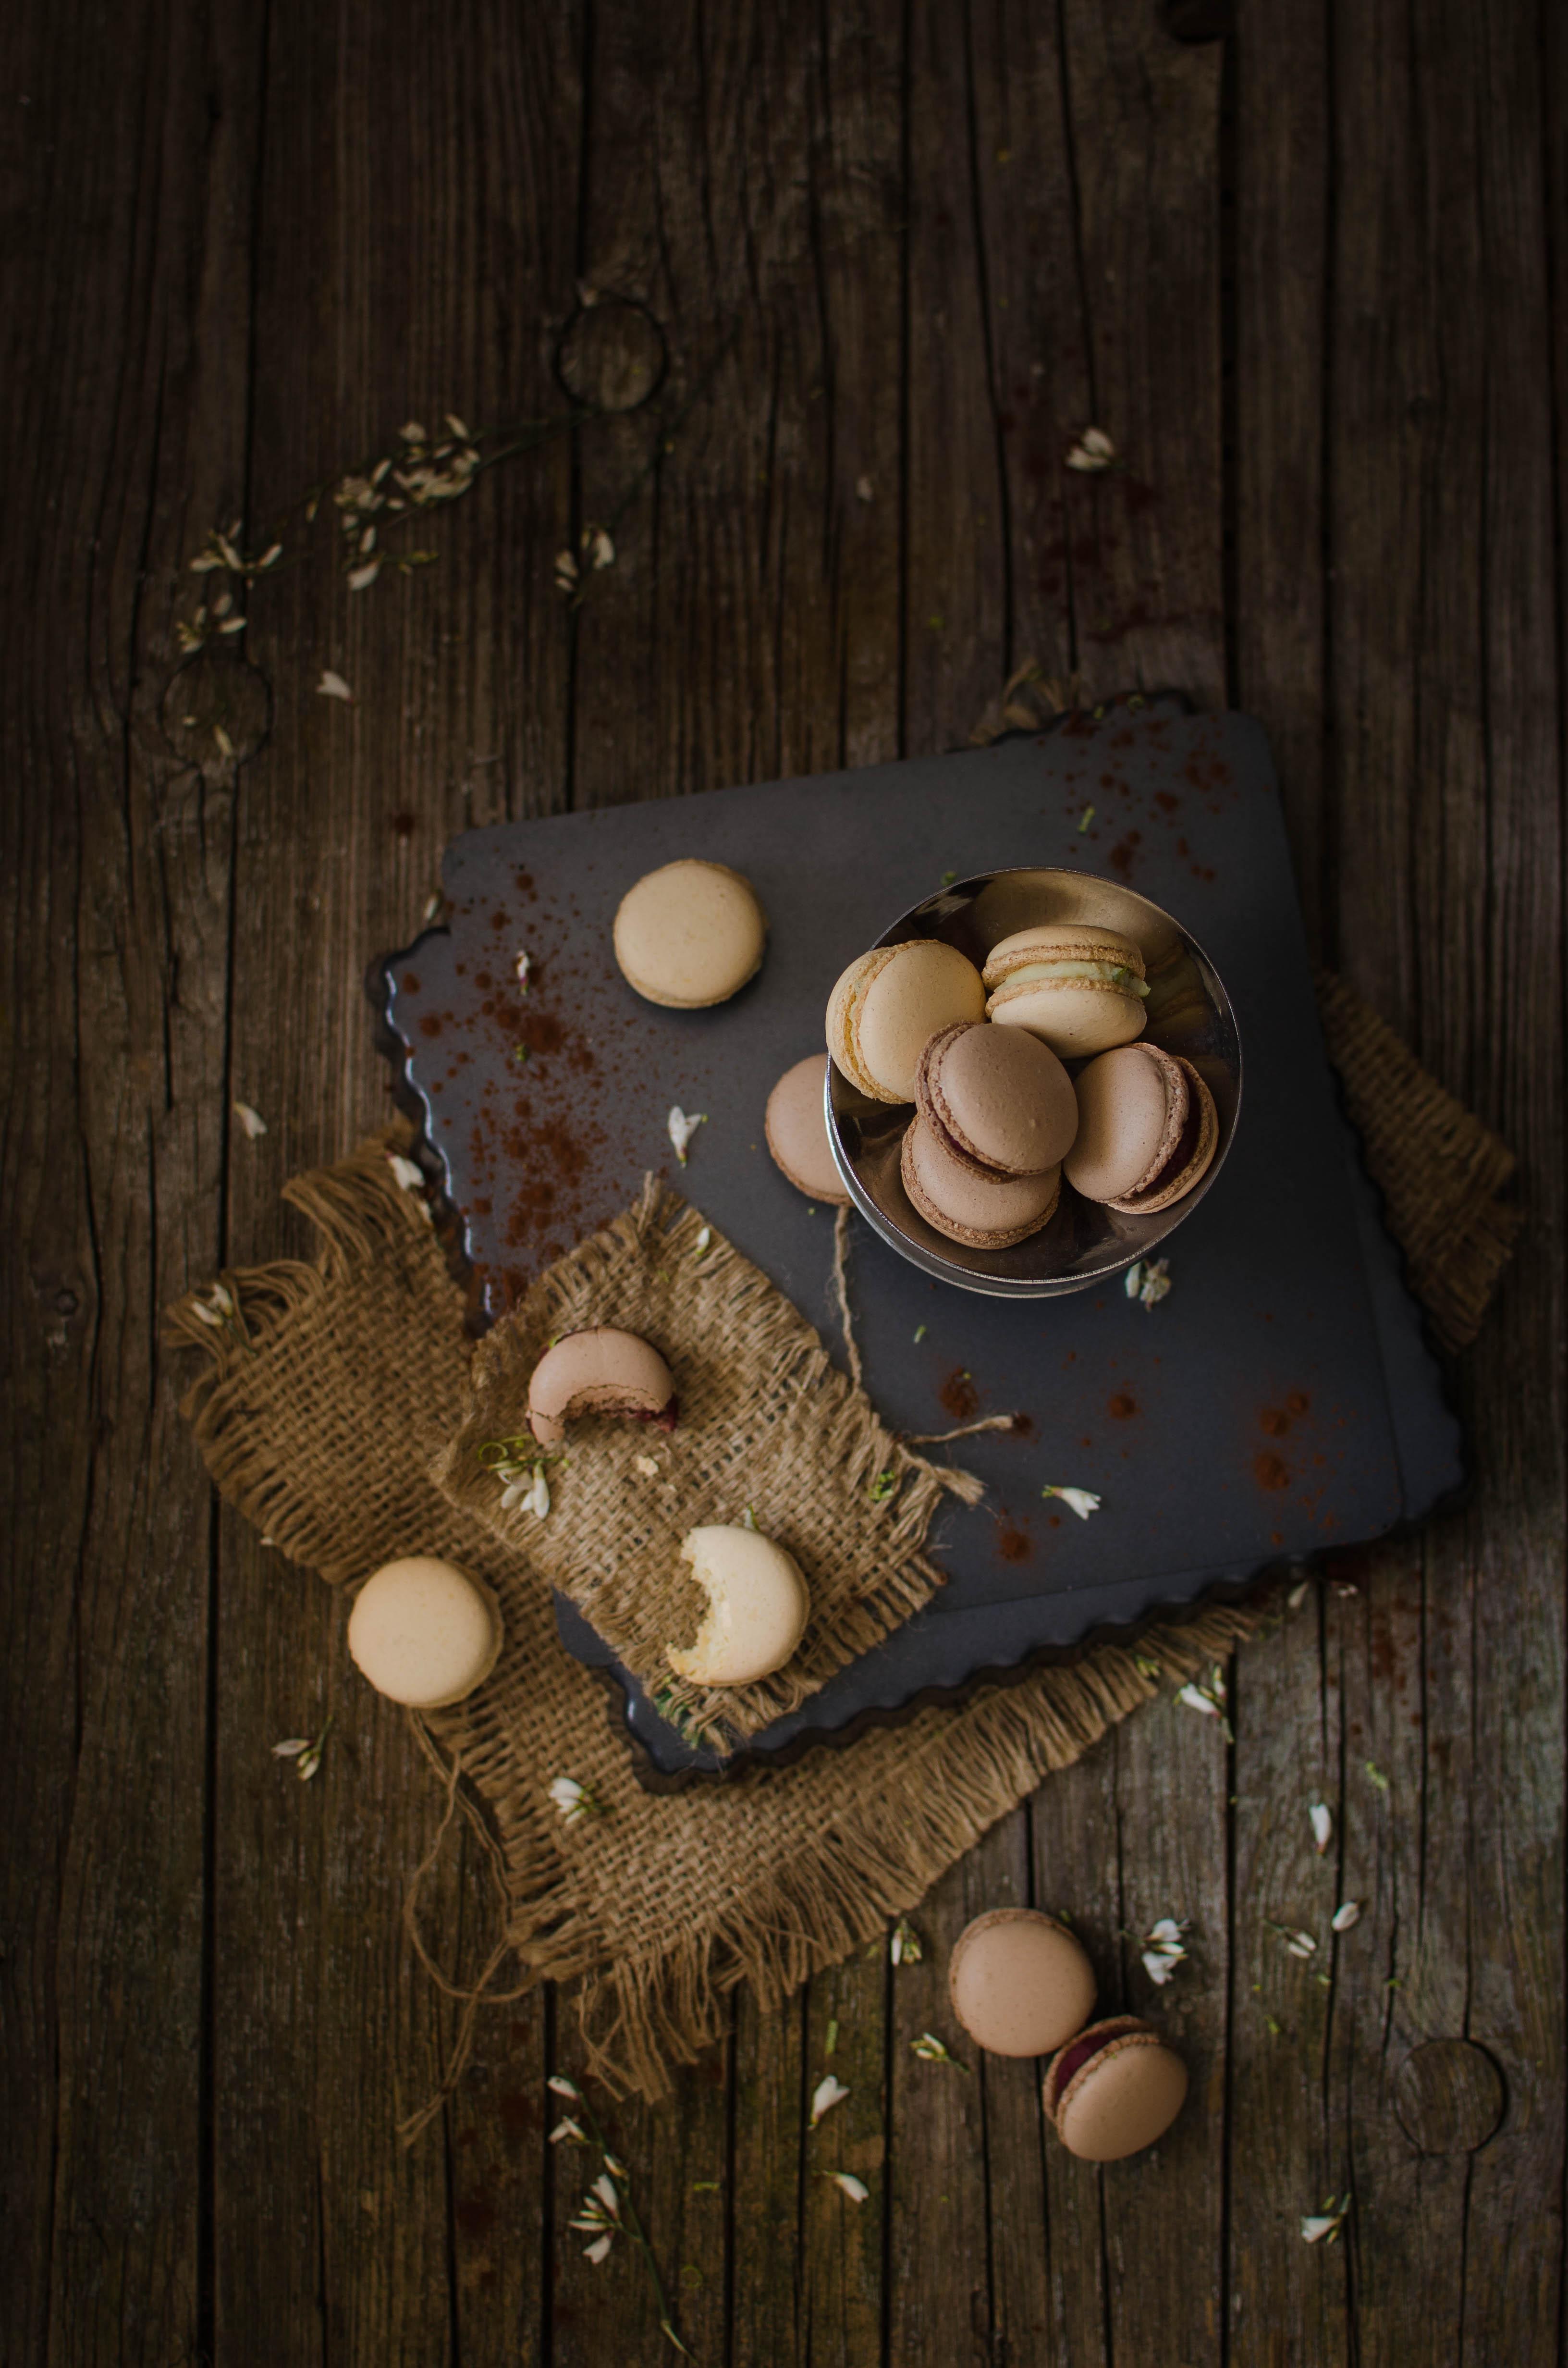 macarons_mtch2 Macarons al cioccolato con barbabietola, lime, cocco, arancia